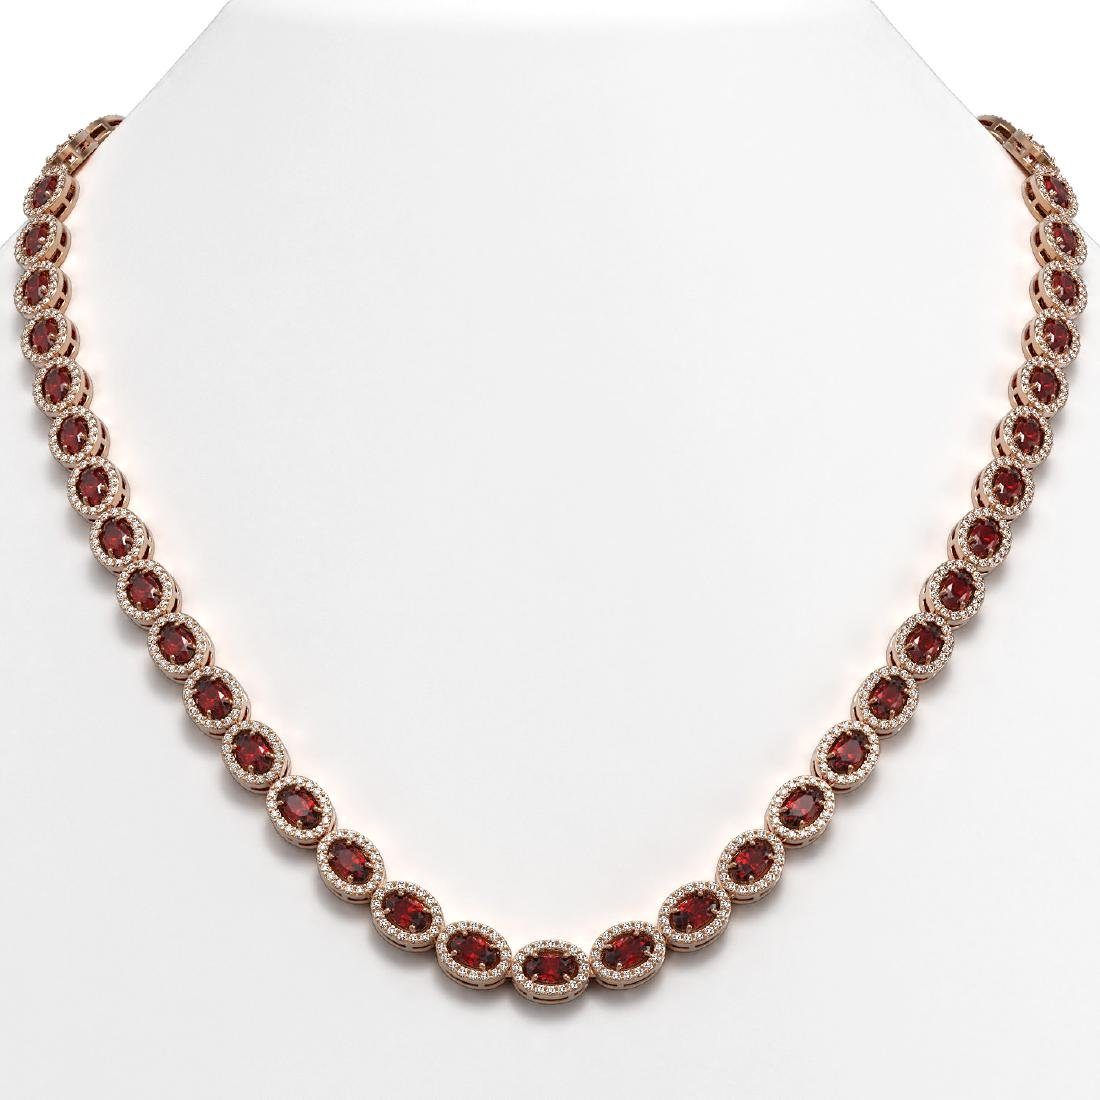 21.04 CTW Garnet & Diamond Halo Necklace 10K Rose Gold